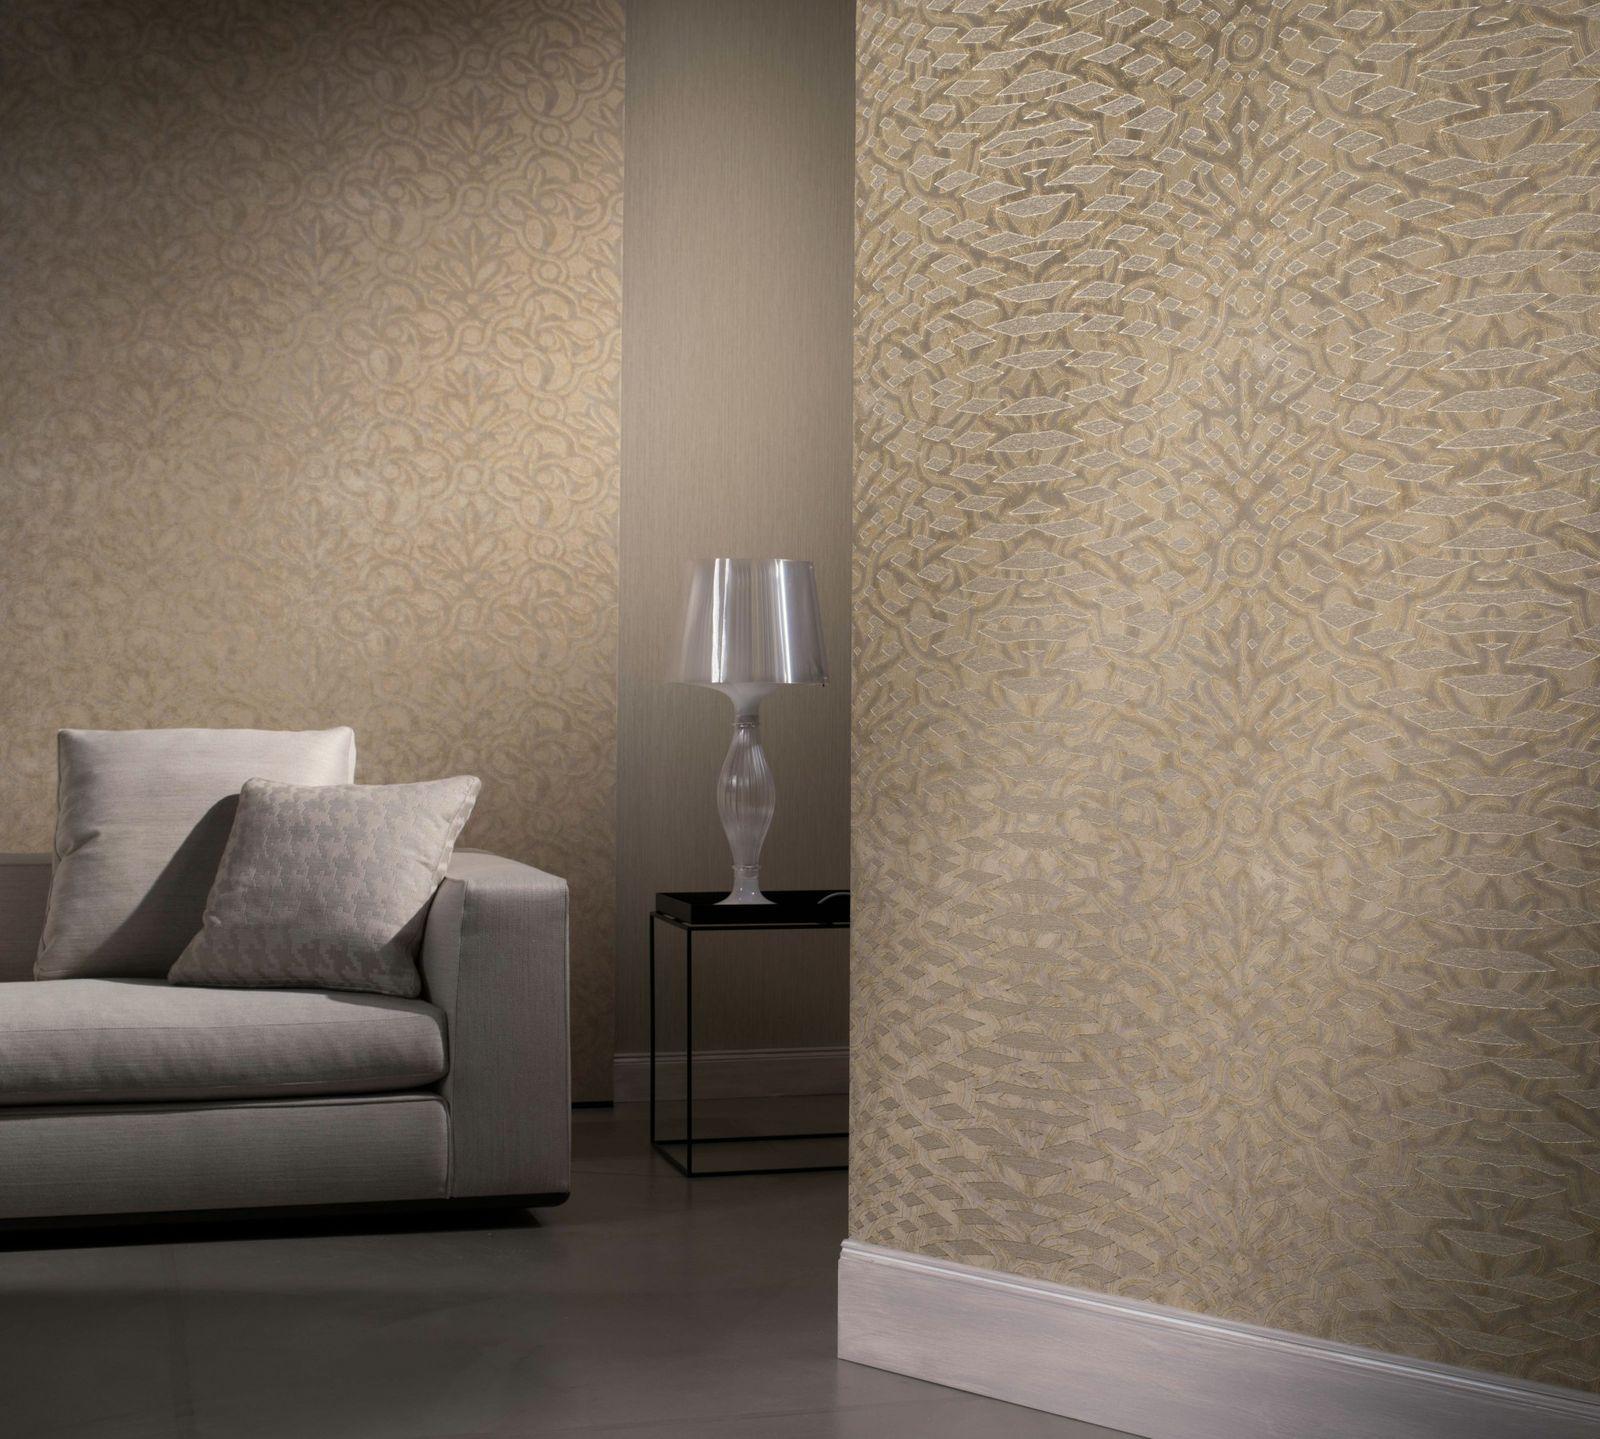 tapete design barock gold beige metallic vliestapete dieter langer view 55968. Black Bedroom Furniture Sets. Home Design Ideas